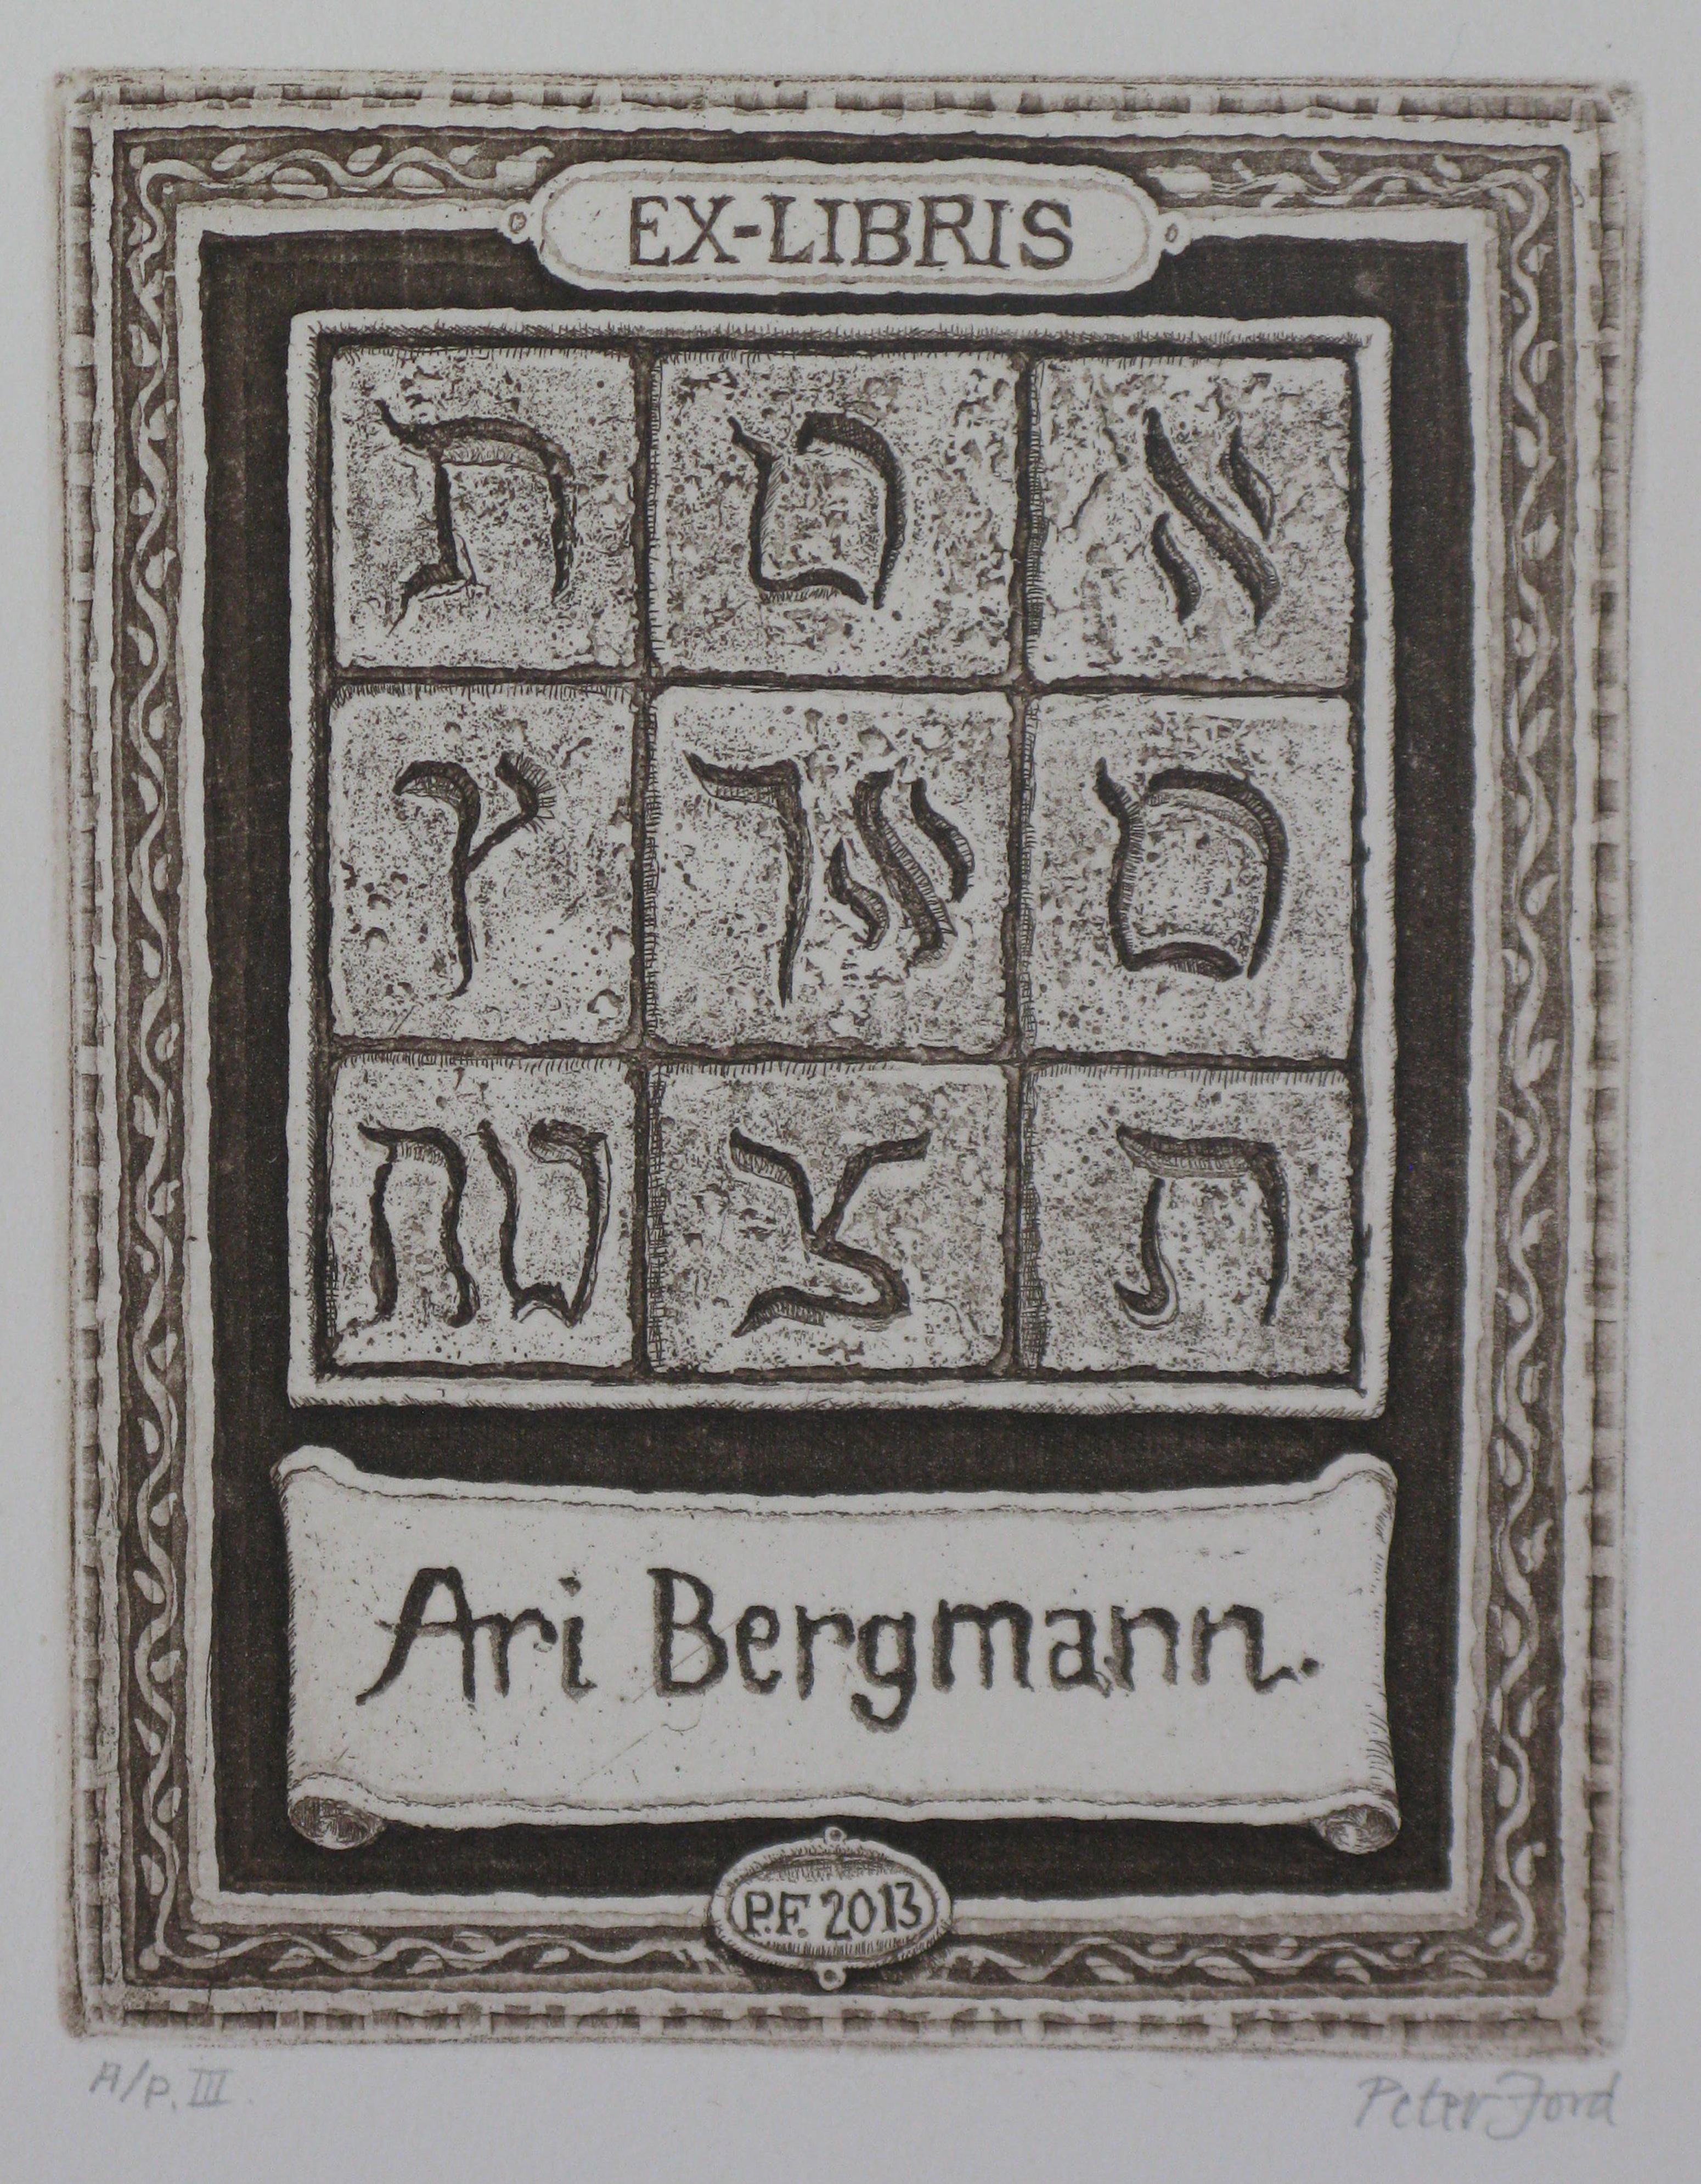 E L Ari Bergmann